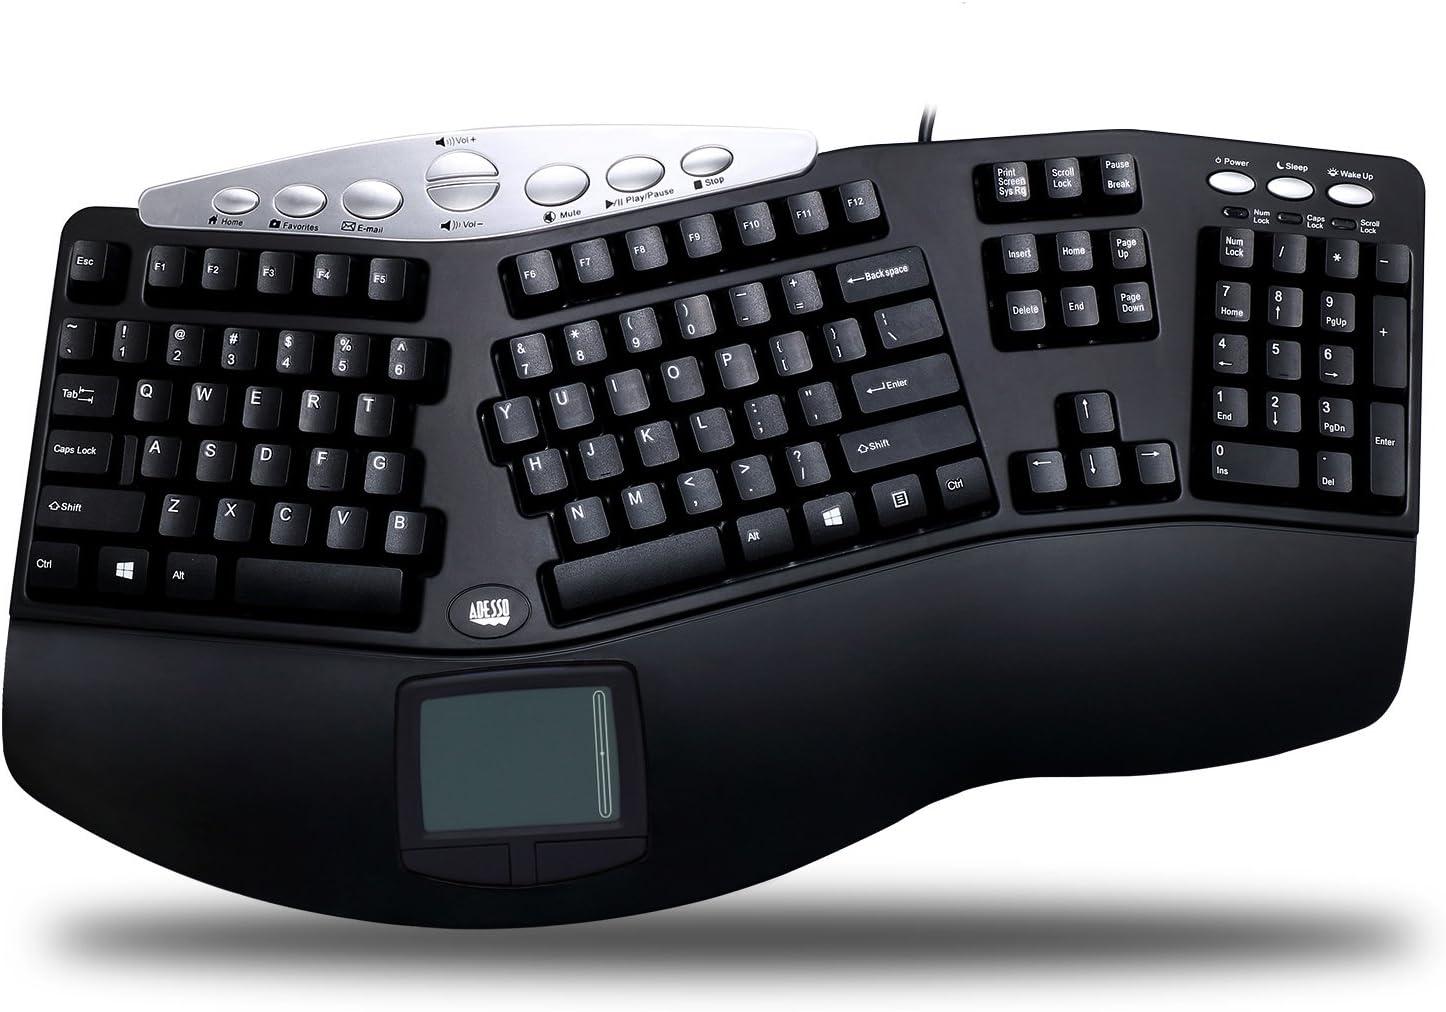 Adesso Tru-Form Pro PCK-308UB - Keyboard - PS2 - 105 keys - ergonomic - touchpad